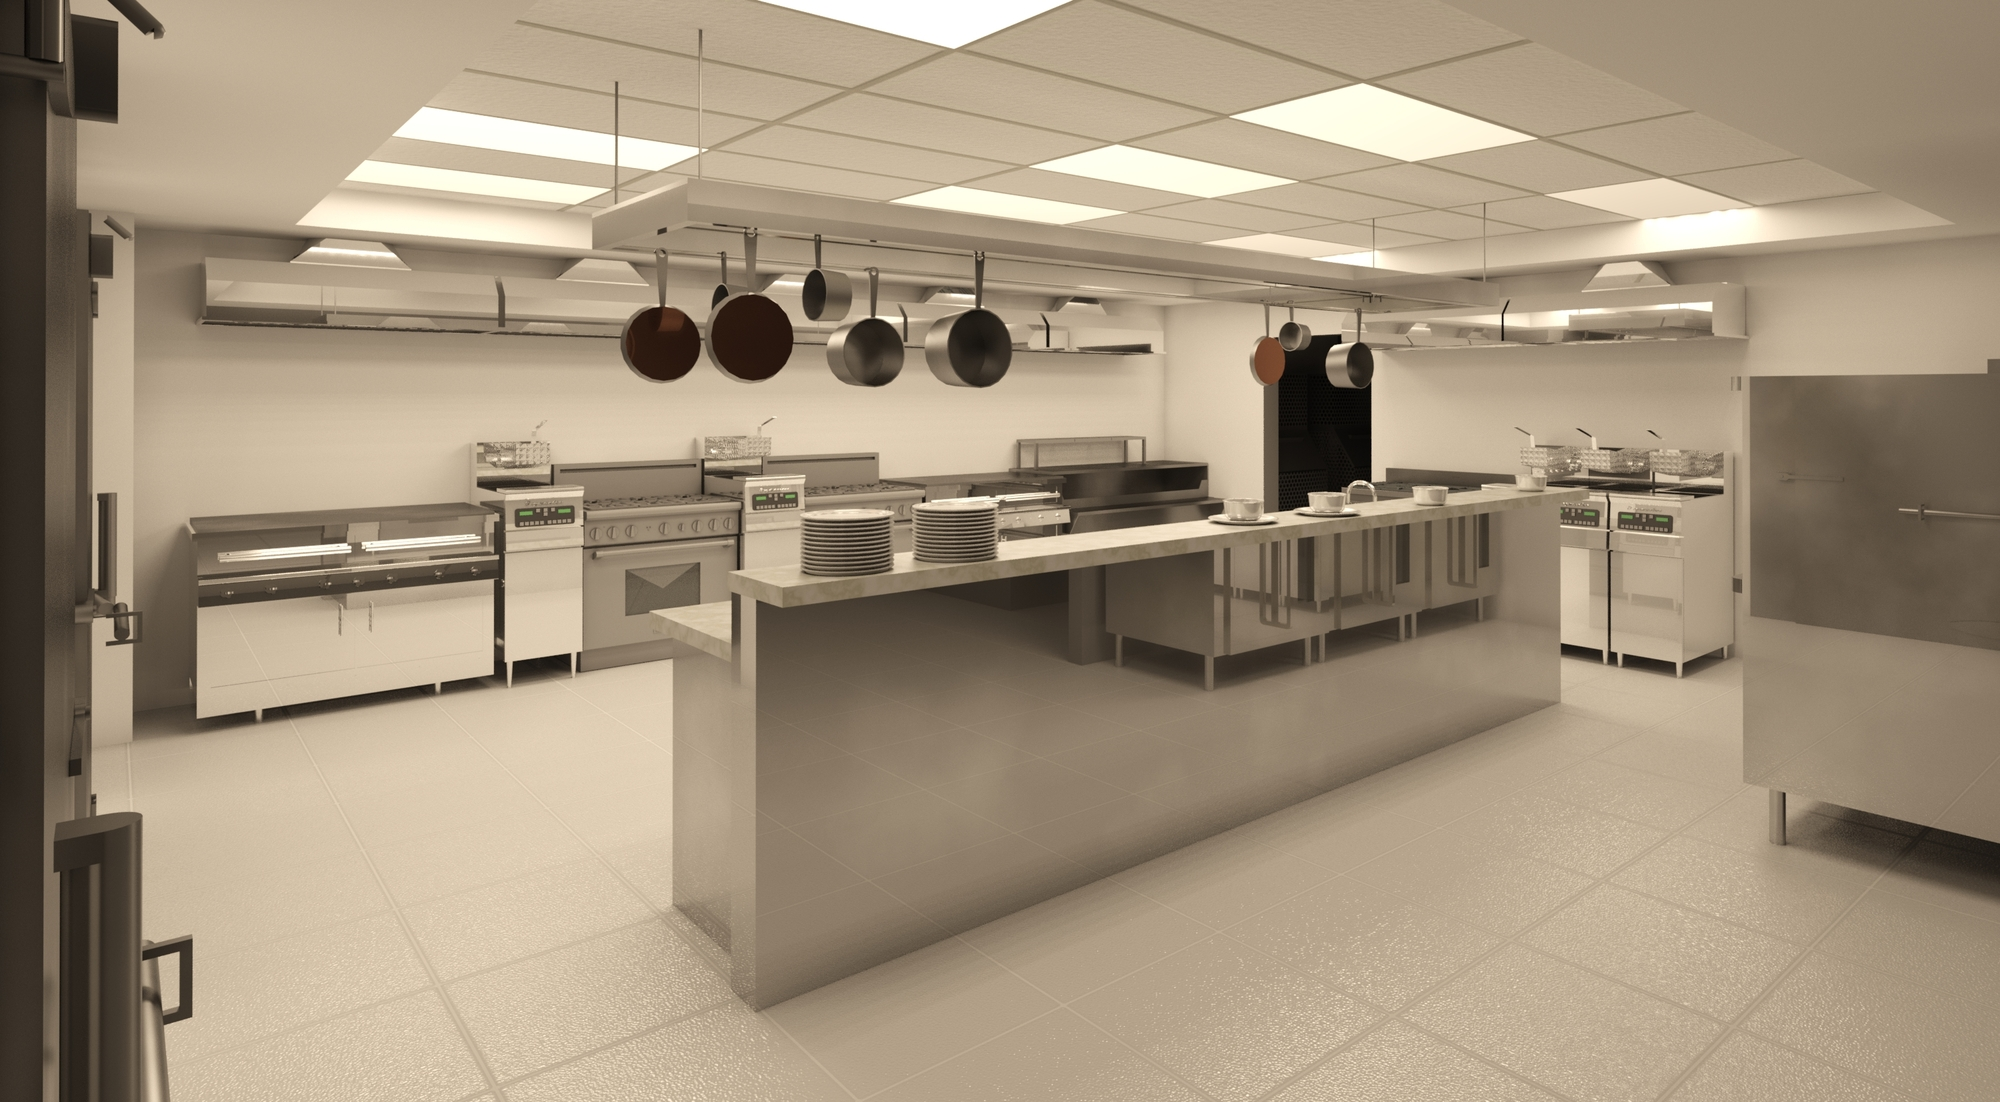 Cocina industrial autodesk online gallery for Valor cocina industrial